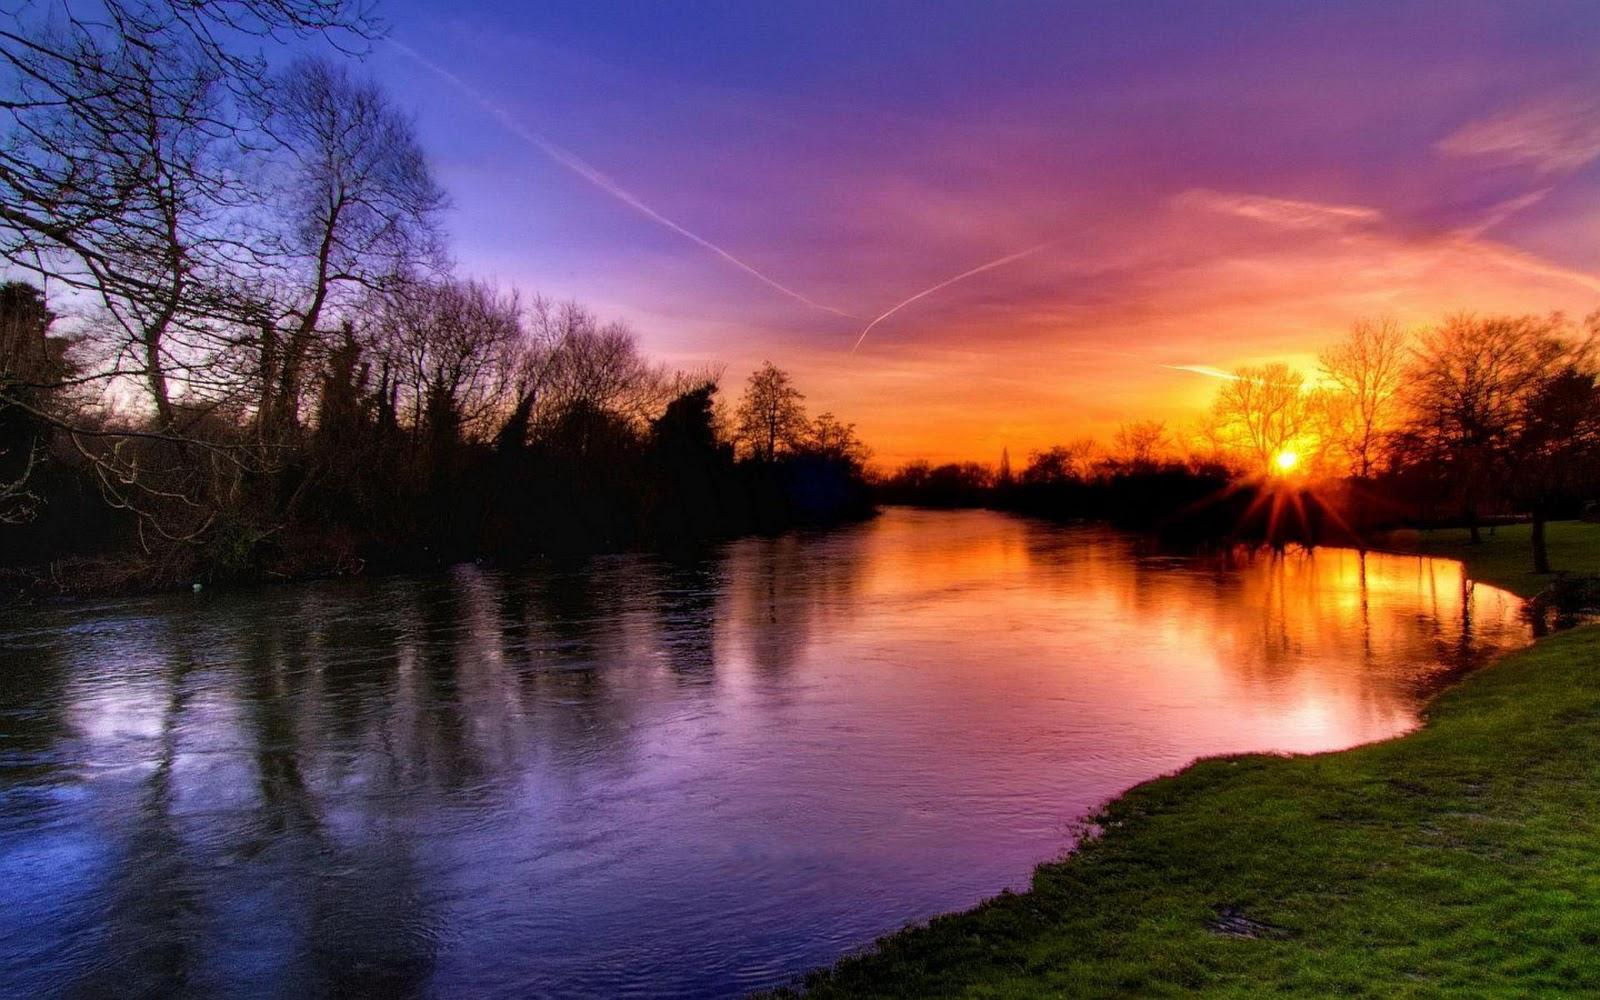 HD Wallpapers Lake Sunsets  WallpaperSafari